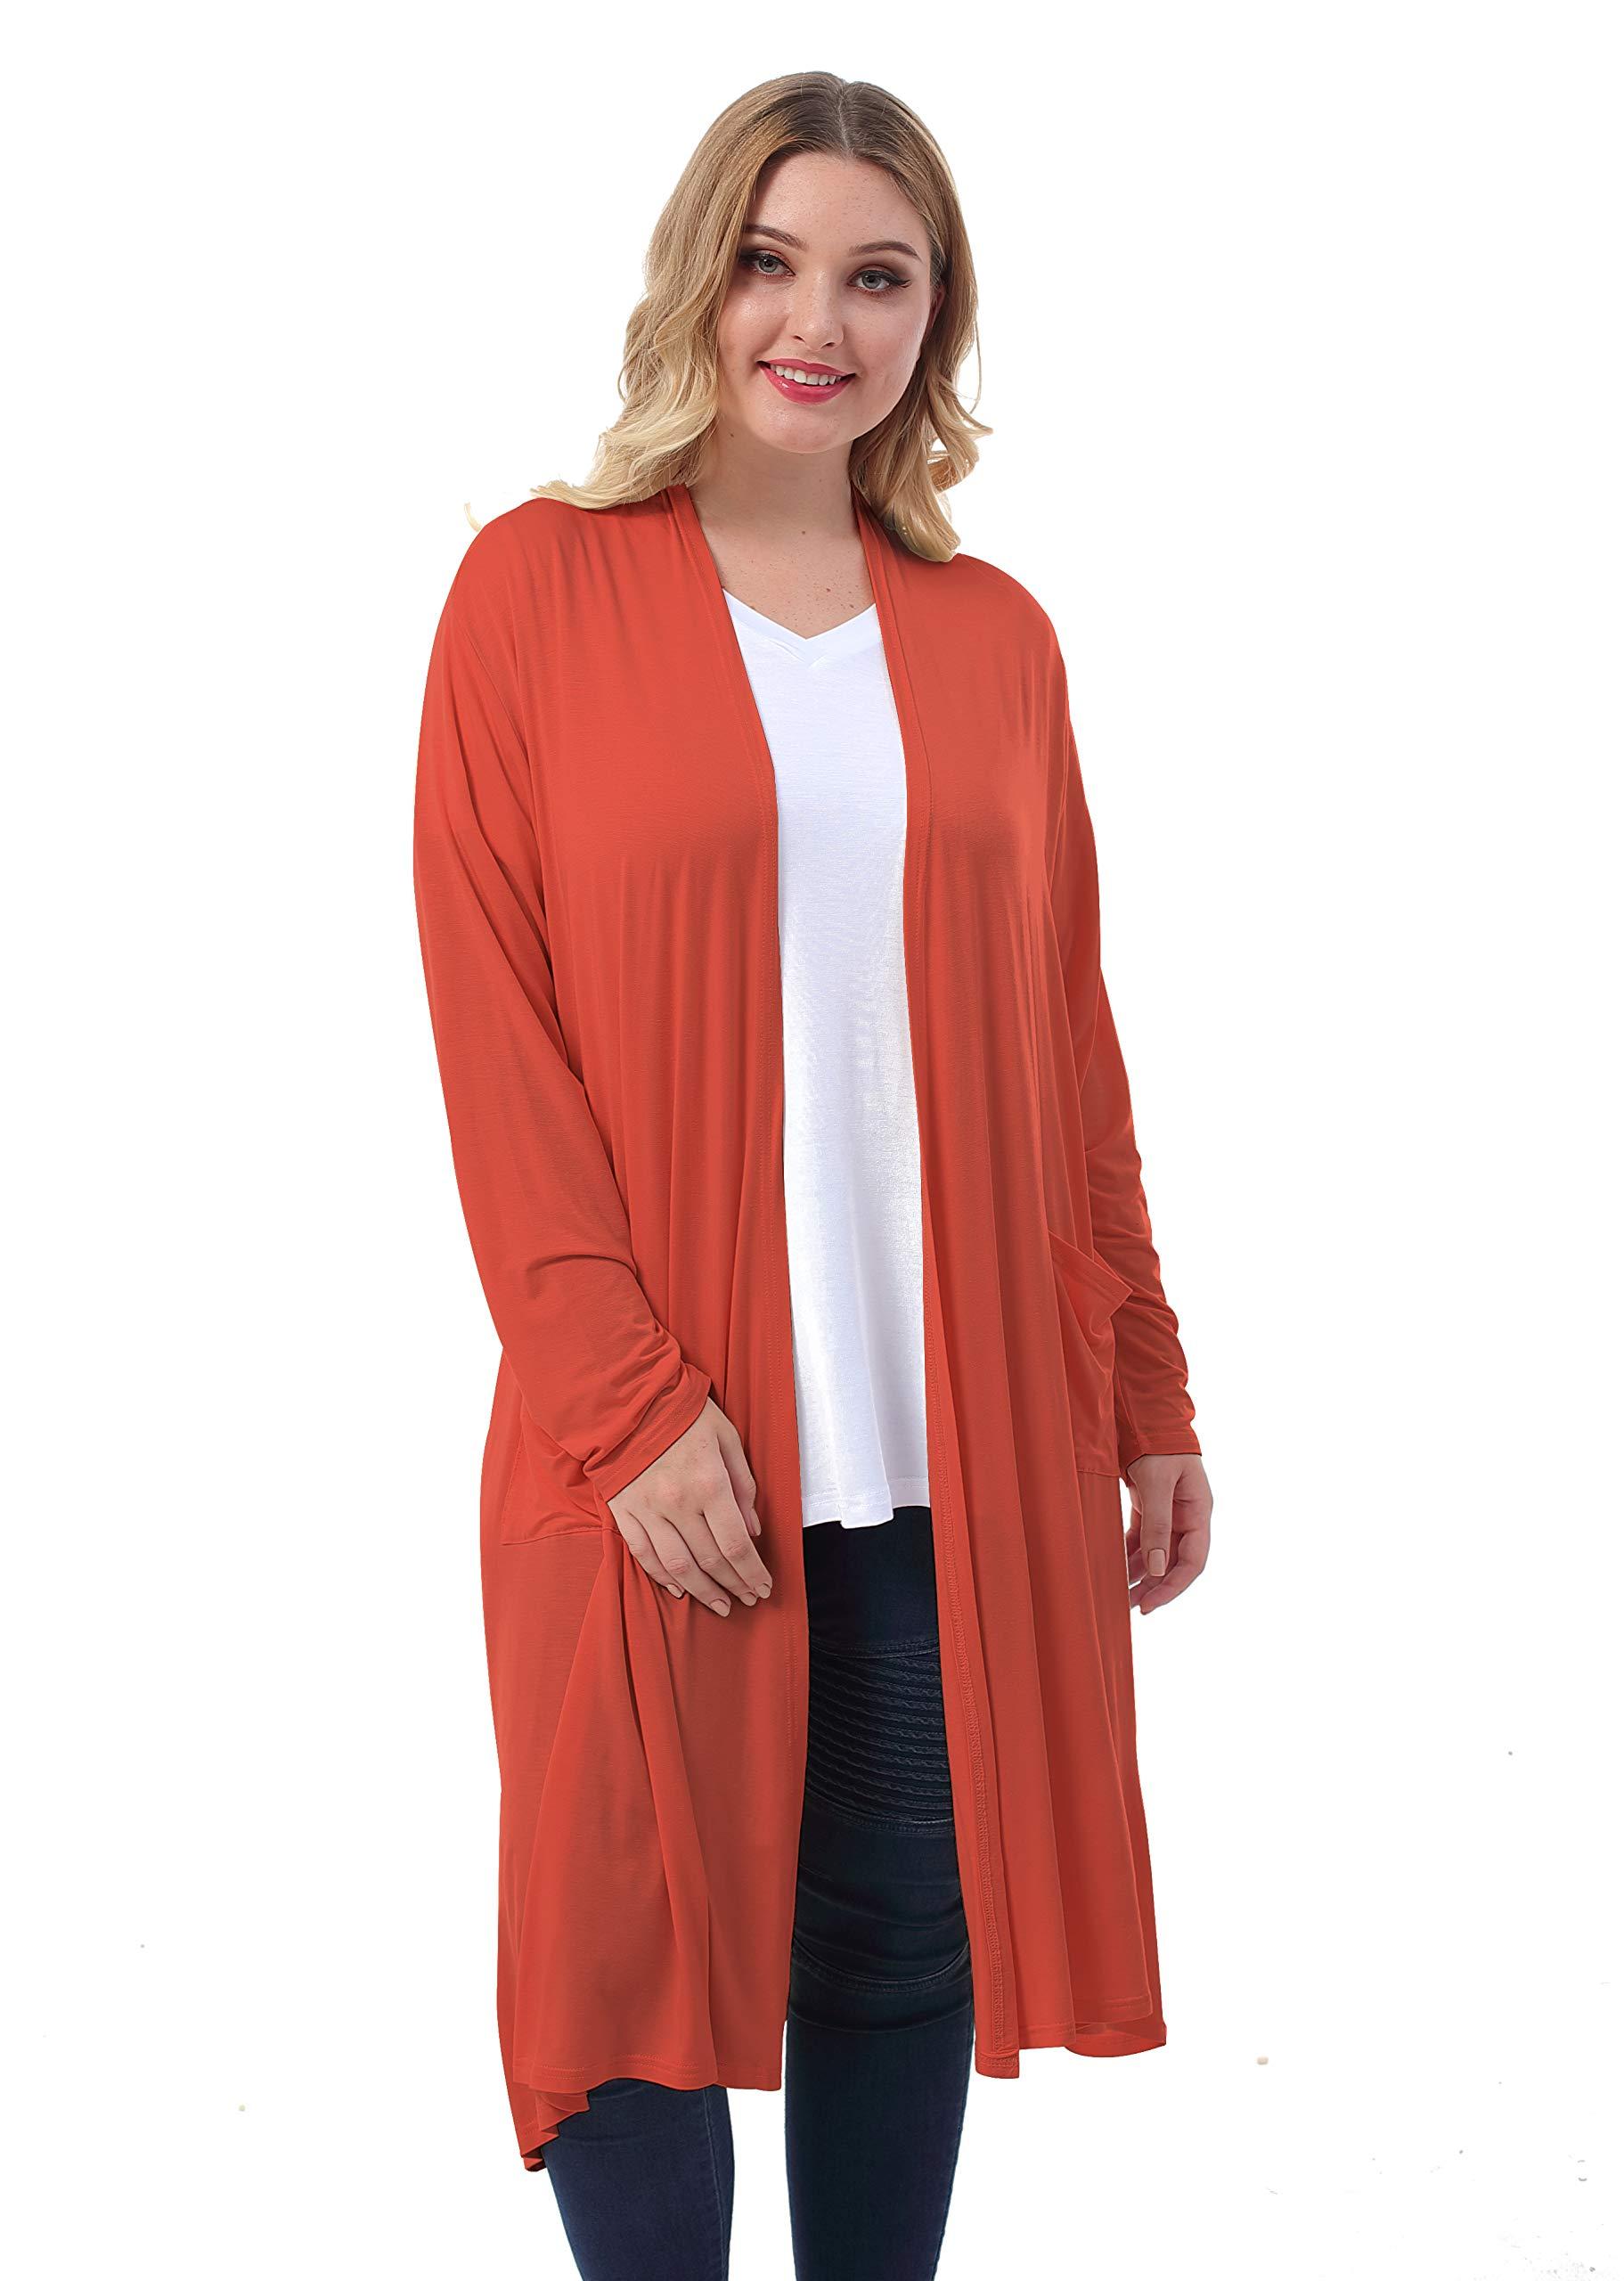 ZERDOCEAN Women's Plus Size Long Cardigan Long Sleeve Lightweight Soft Drape Open Front with Pockets.